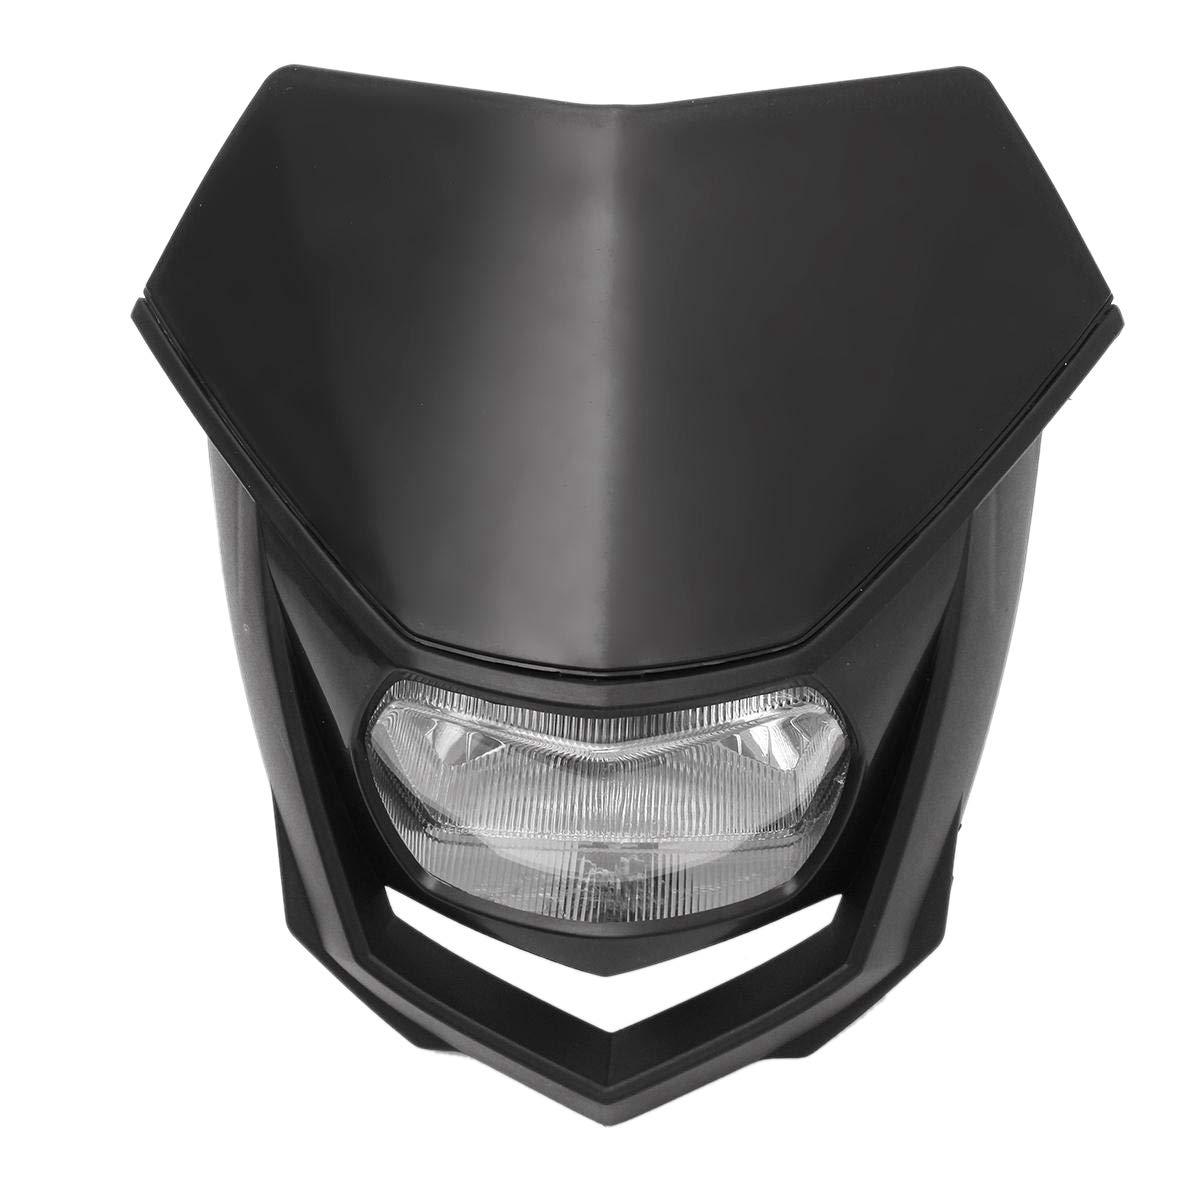 SODIAL 12V Universal Motorcycle Dirt Bike Halo Headlight head light lamp Dirt Bike Headlight Enduro for Crf Xr Wrf Yzf Drz Klx Ym-004